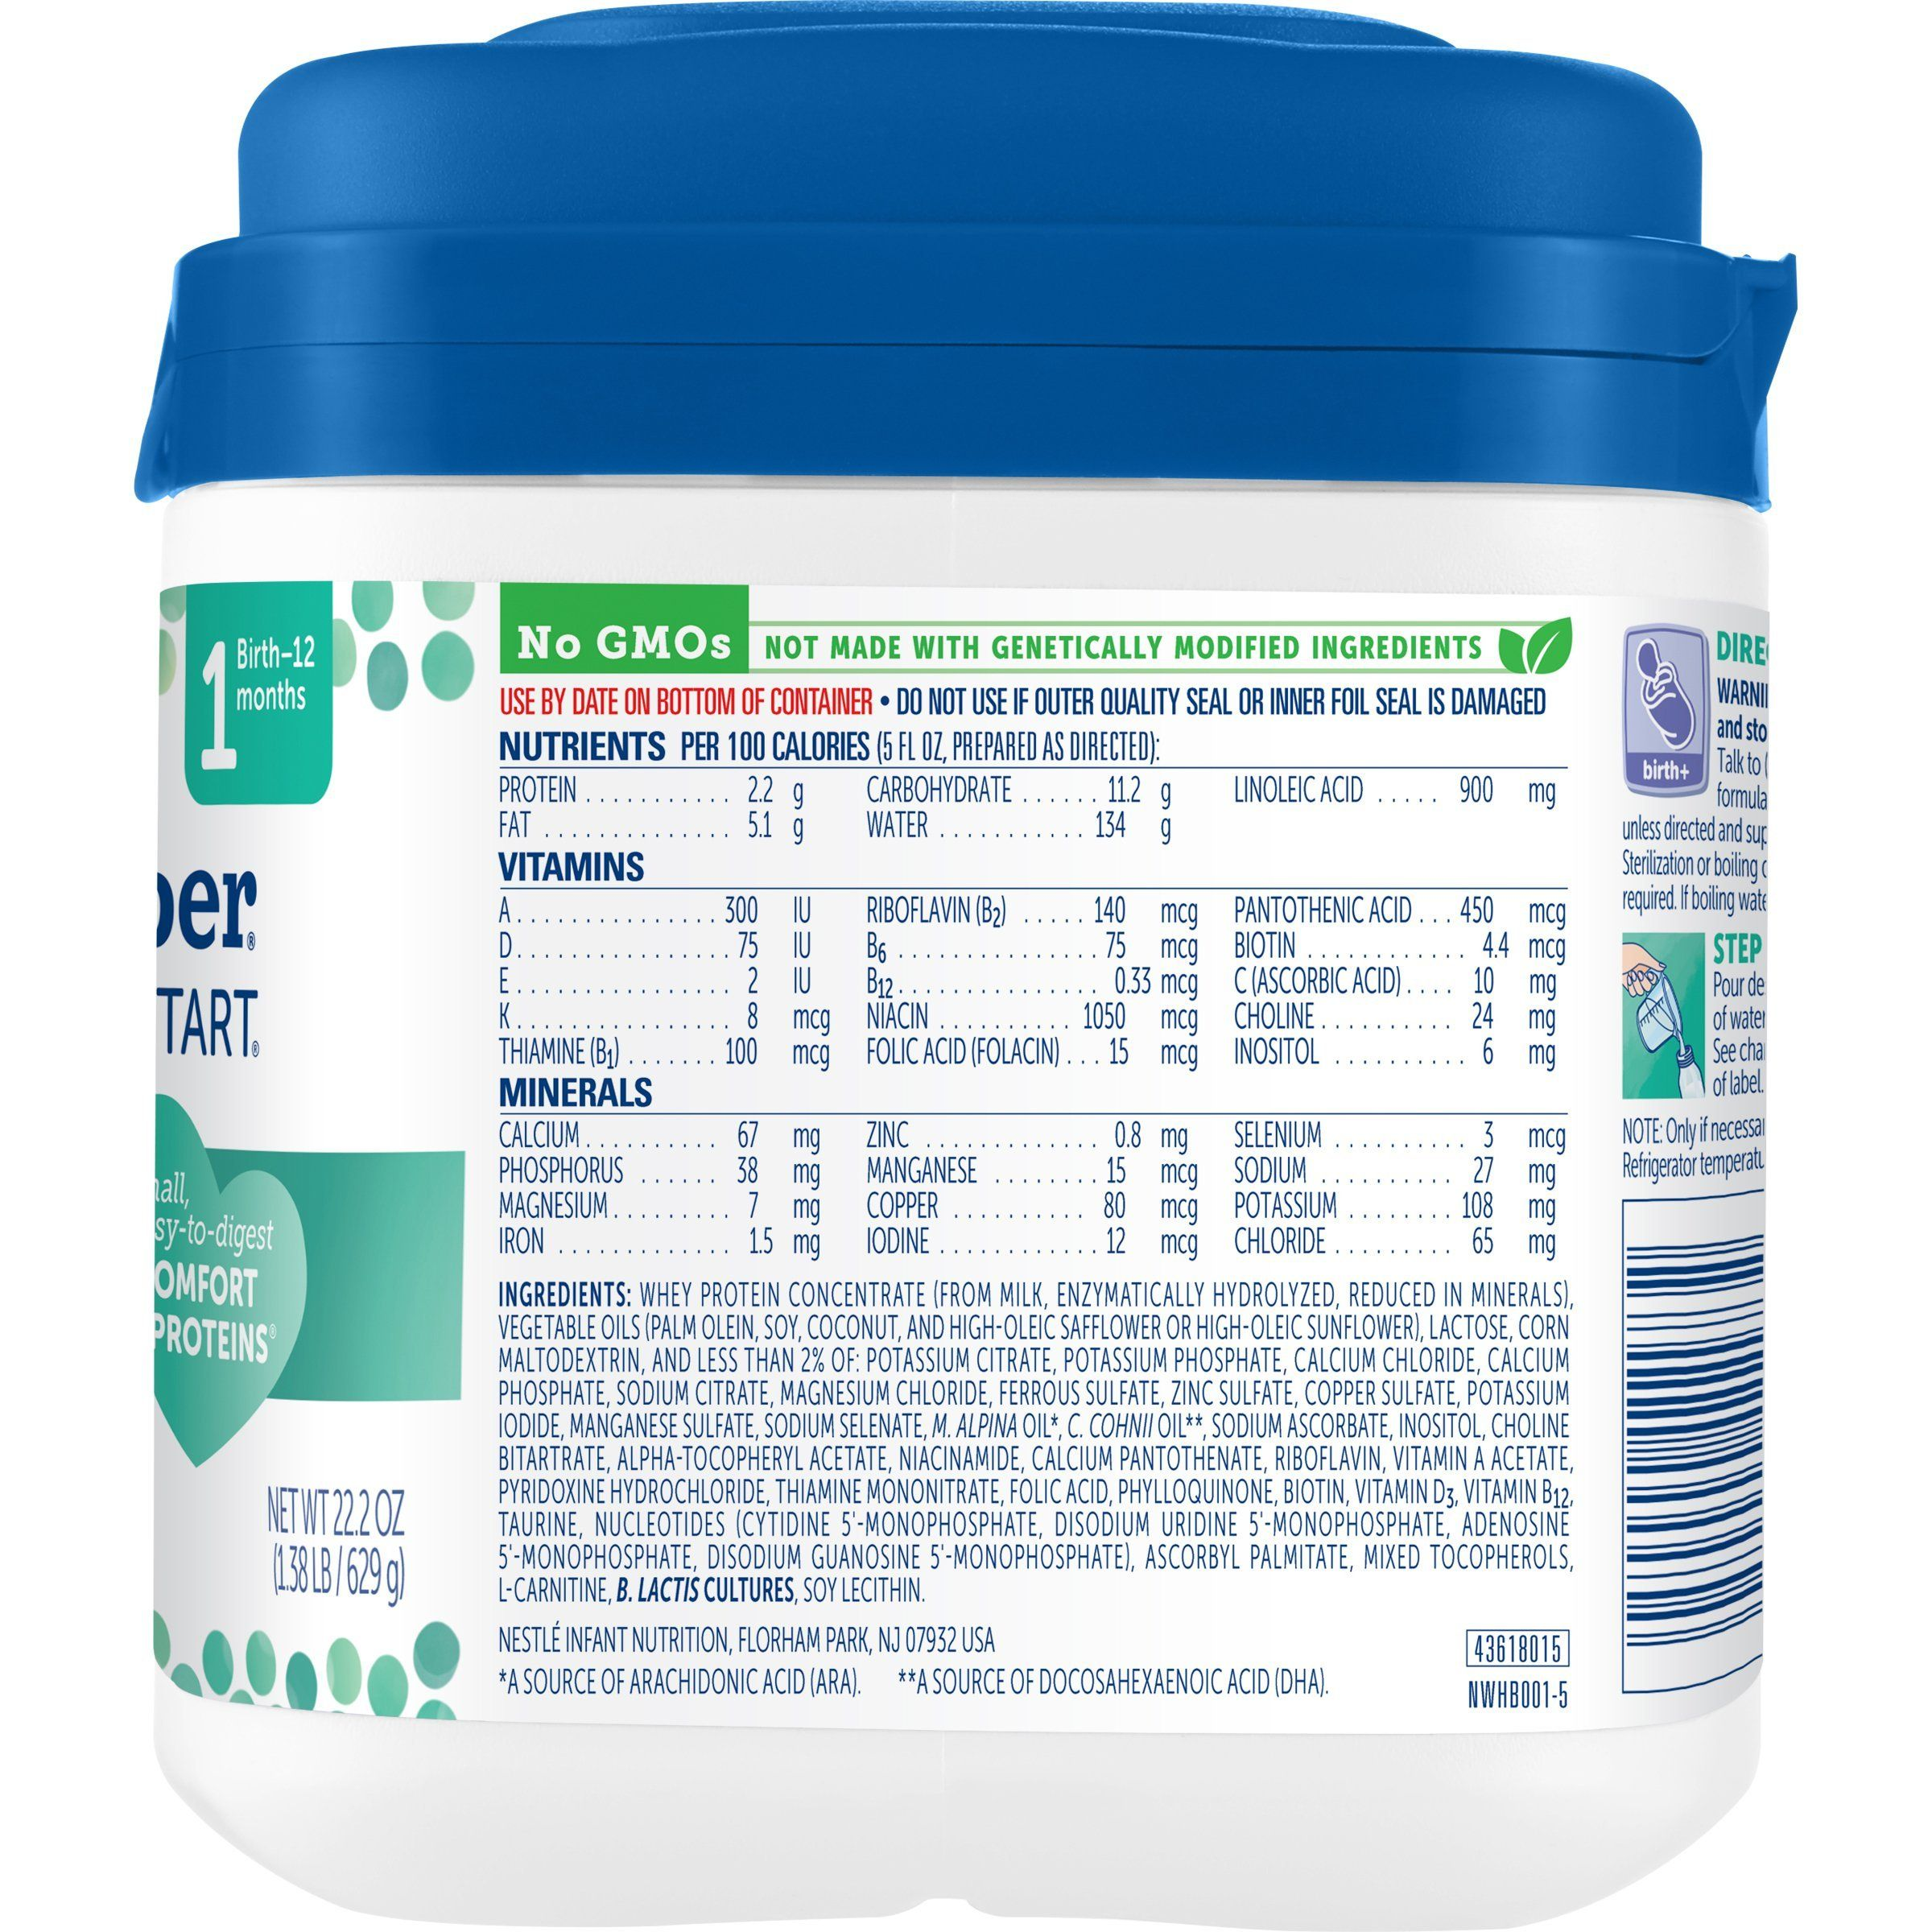 Gerber good start gentle for supplementing nongmo powder